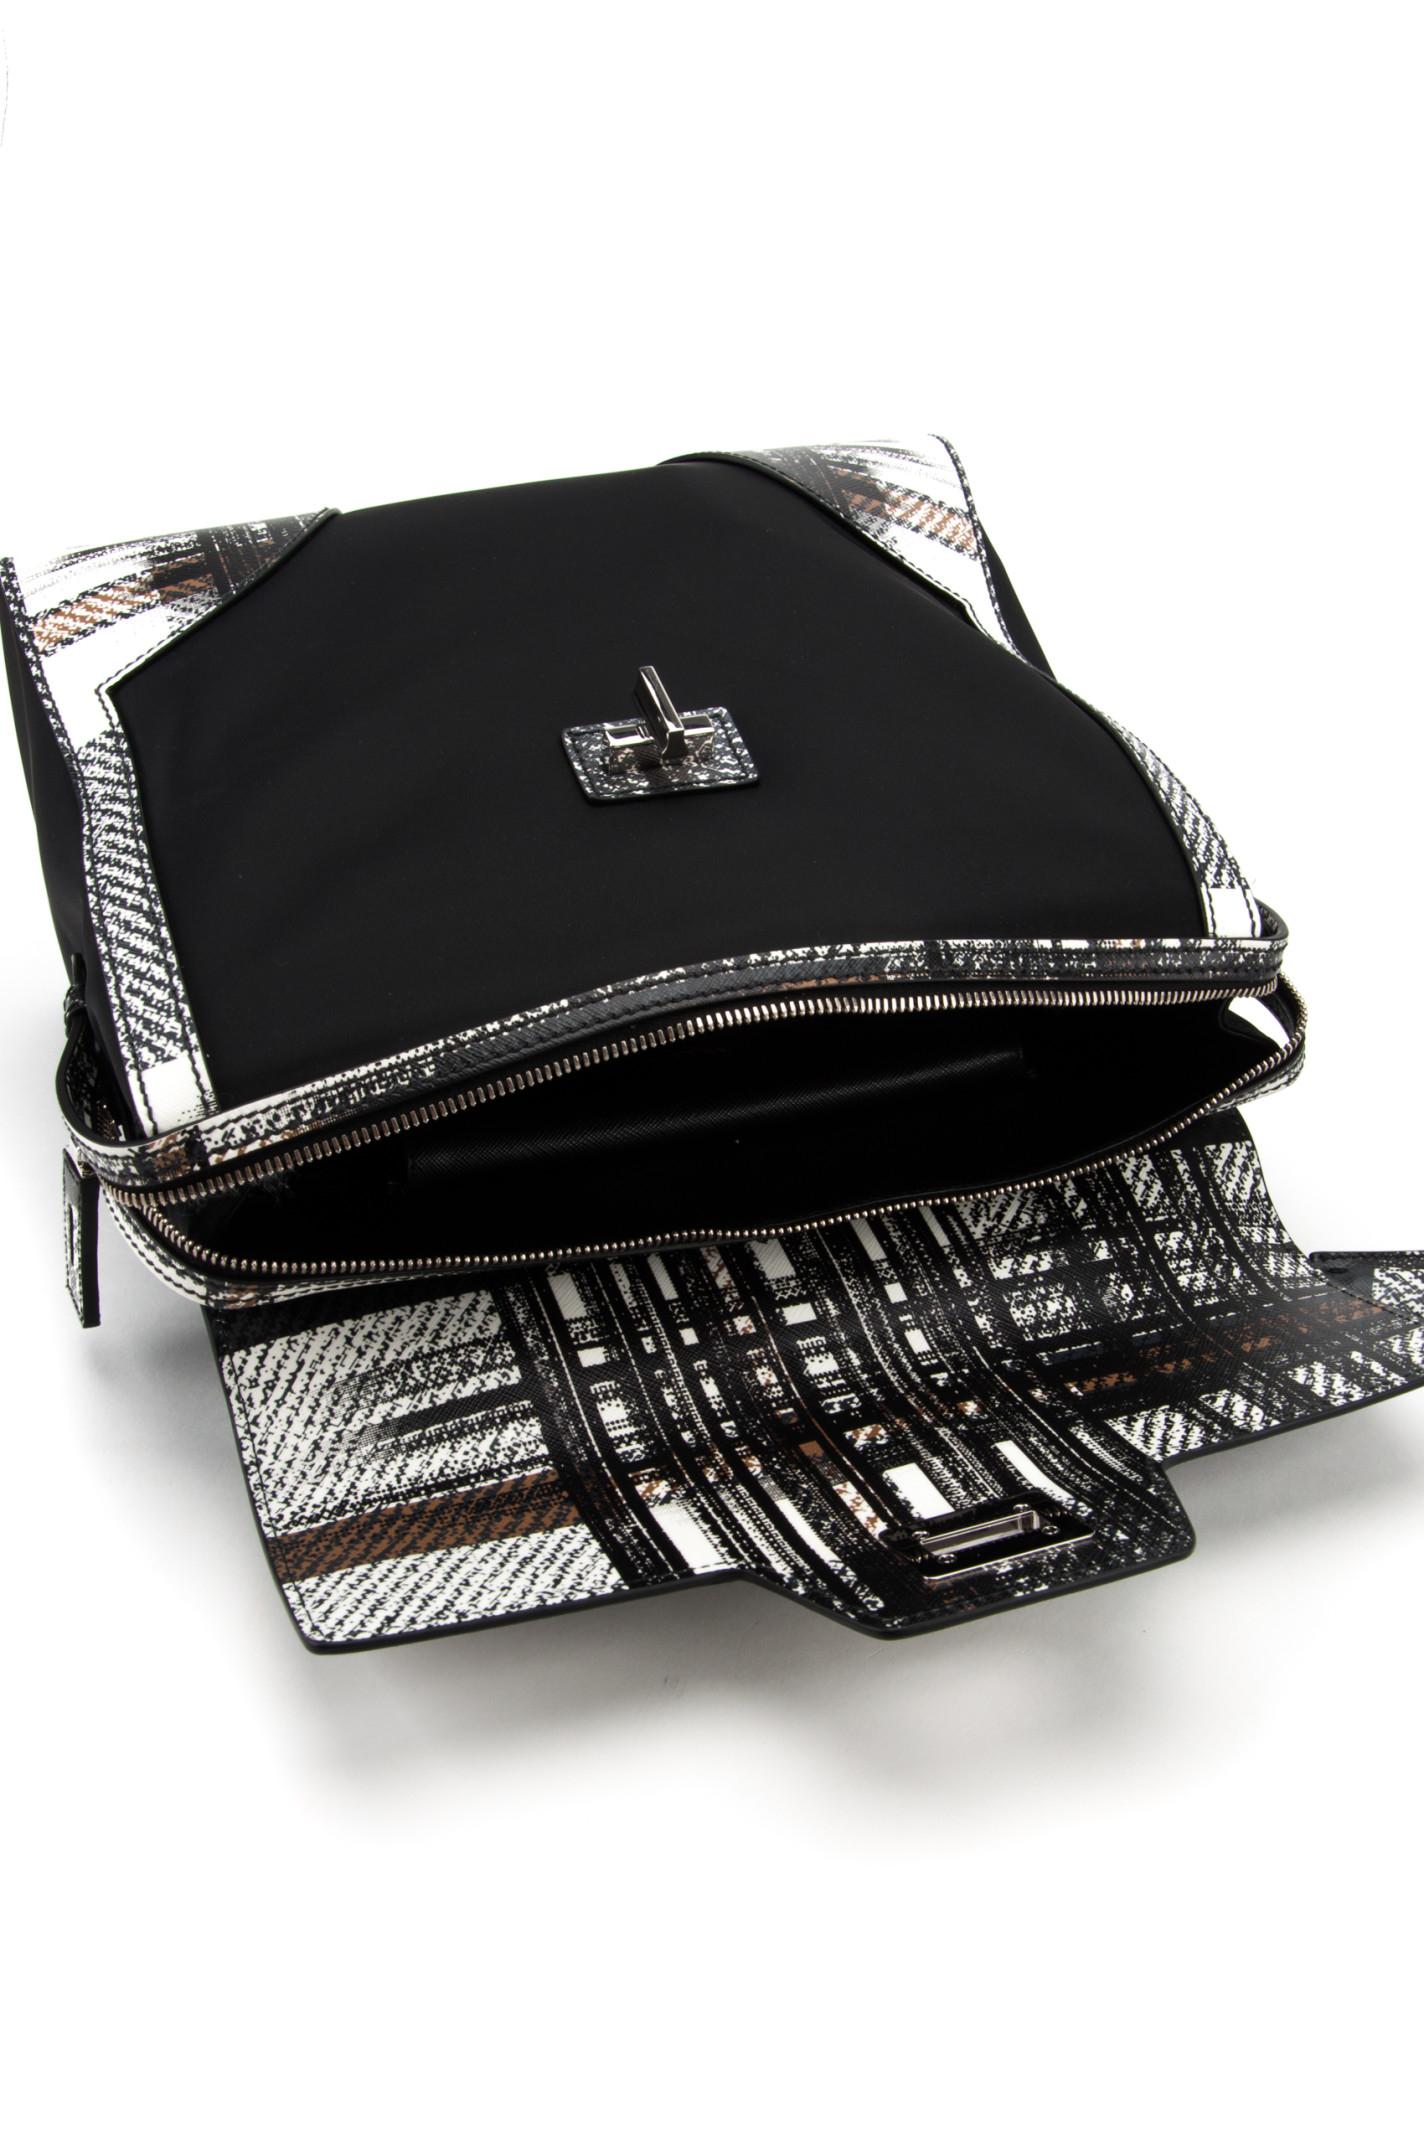 Prada Nylon And Saffiano Bag in Silver (BIANCO DIS. TARTAN) | Lyst